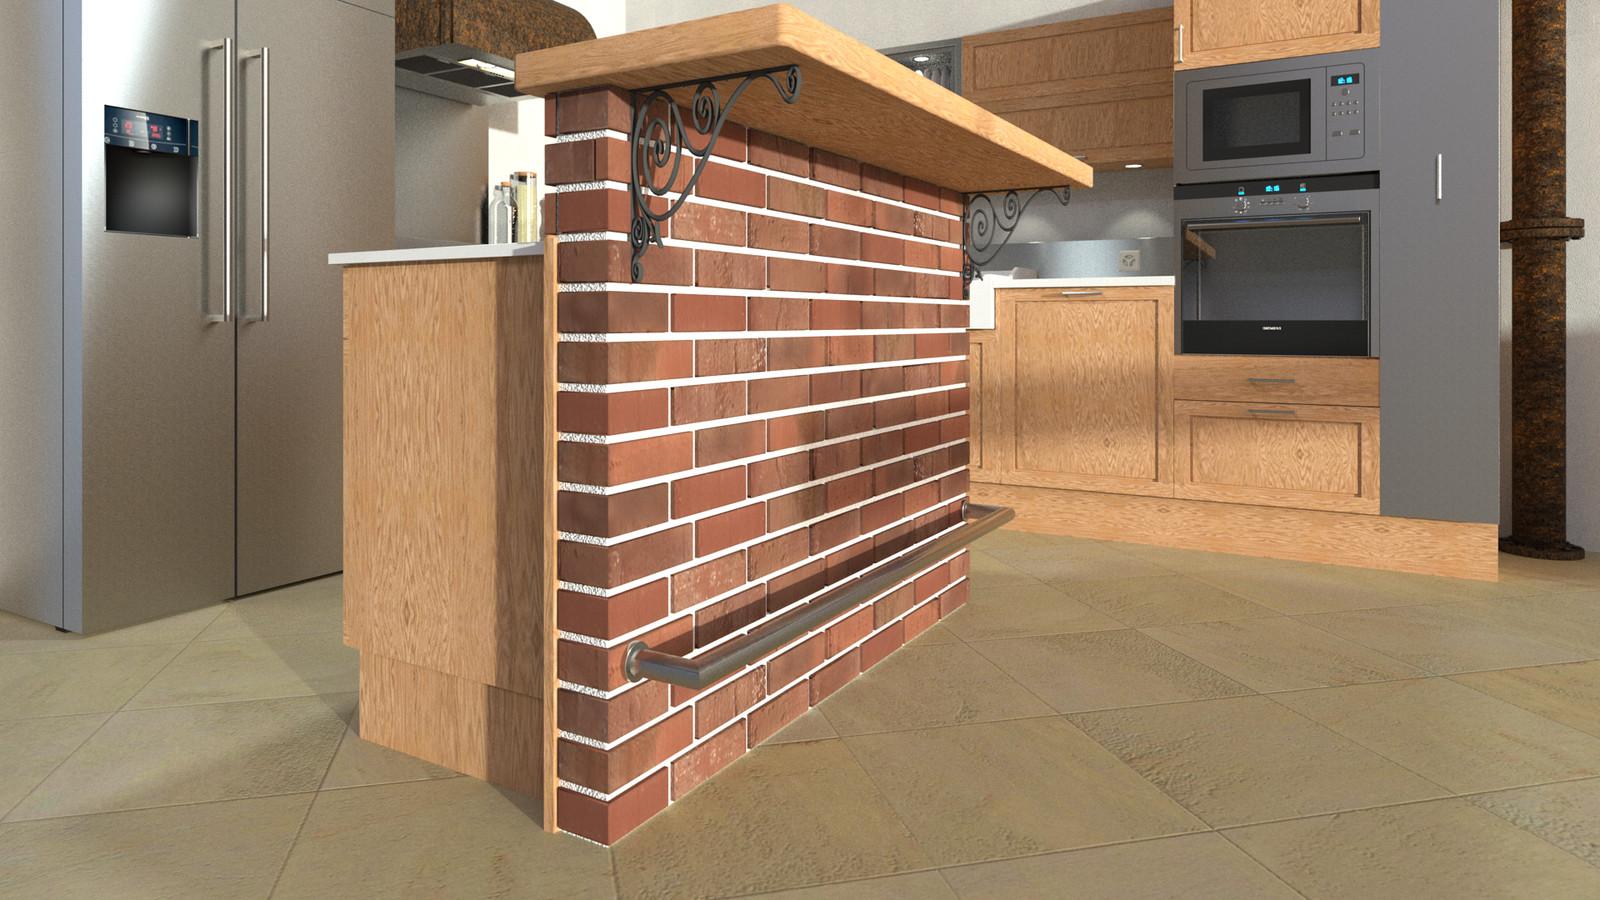 SketchUp + Thea Render  Rivendell Mill's Kitchen Bar Rivendell Brick Bar 2017-Scene 05